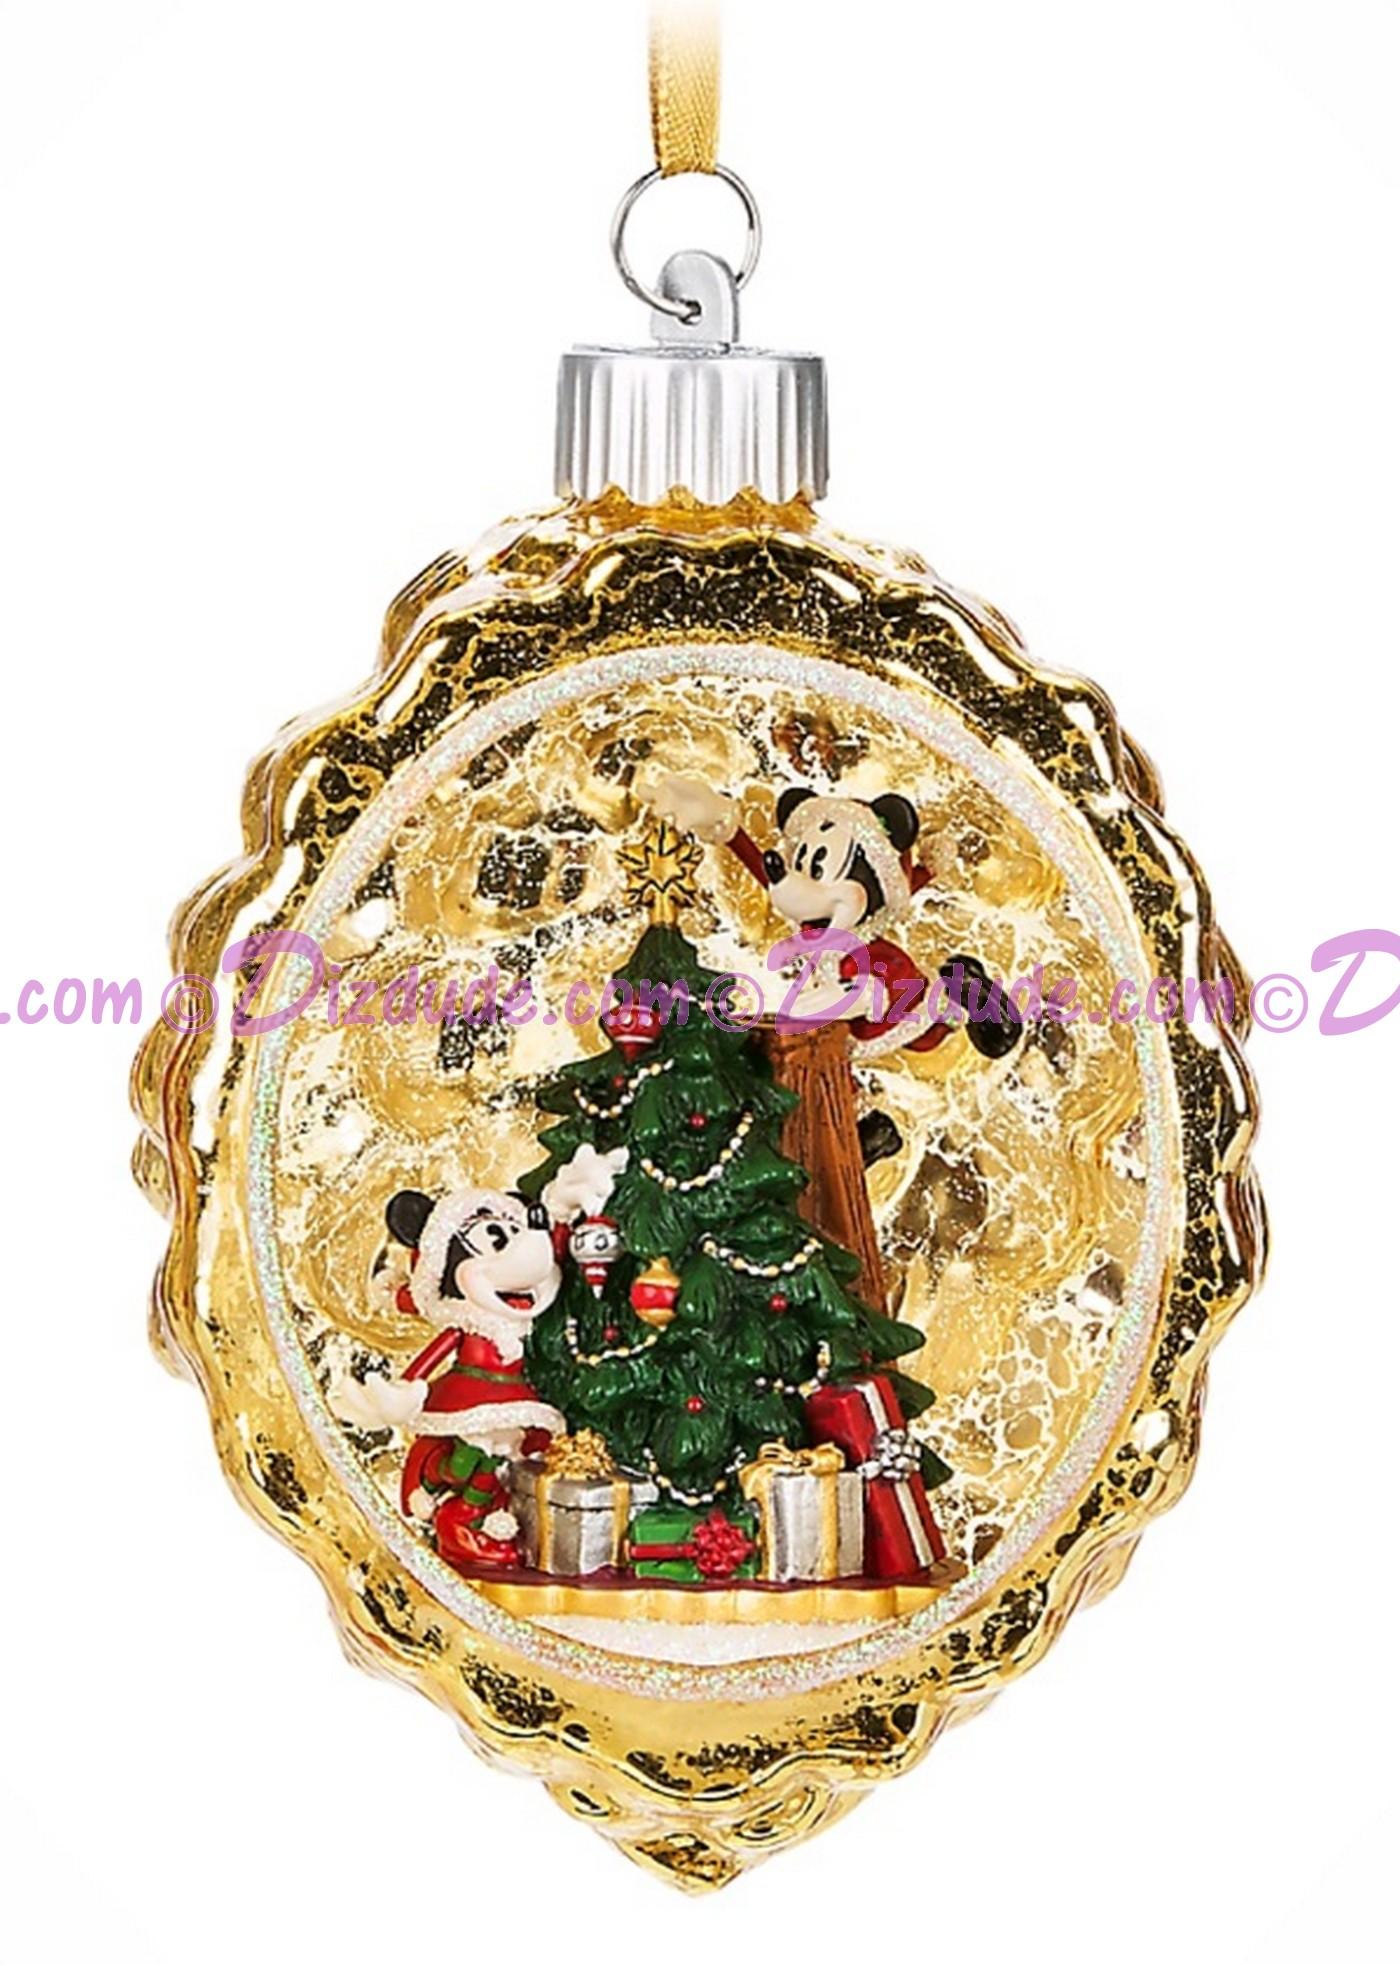 Disney Turn of the Century Mickey and Minnie Light Up Christmas Ornament © Dizdude.com